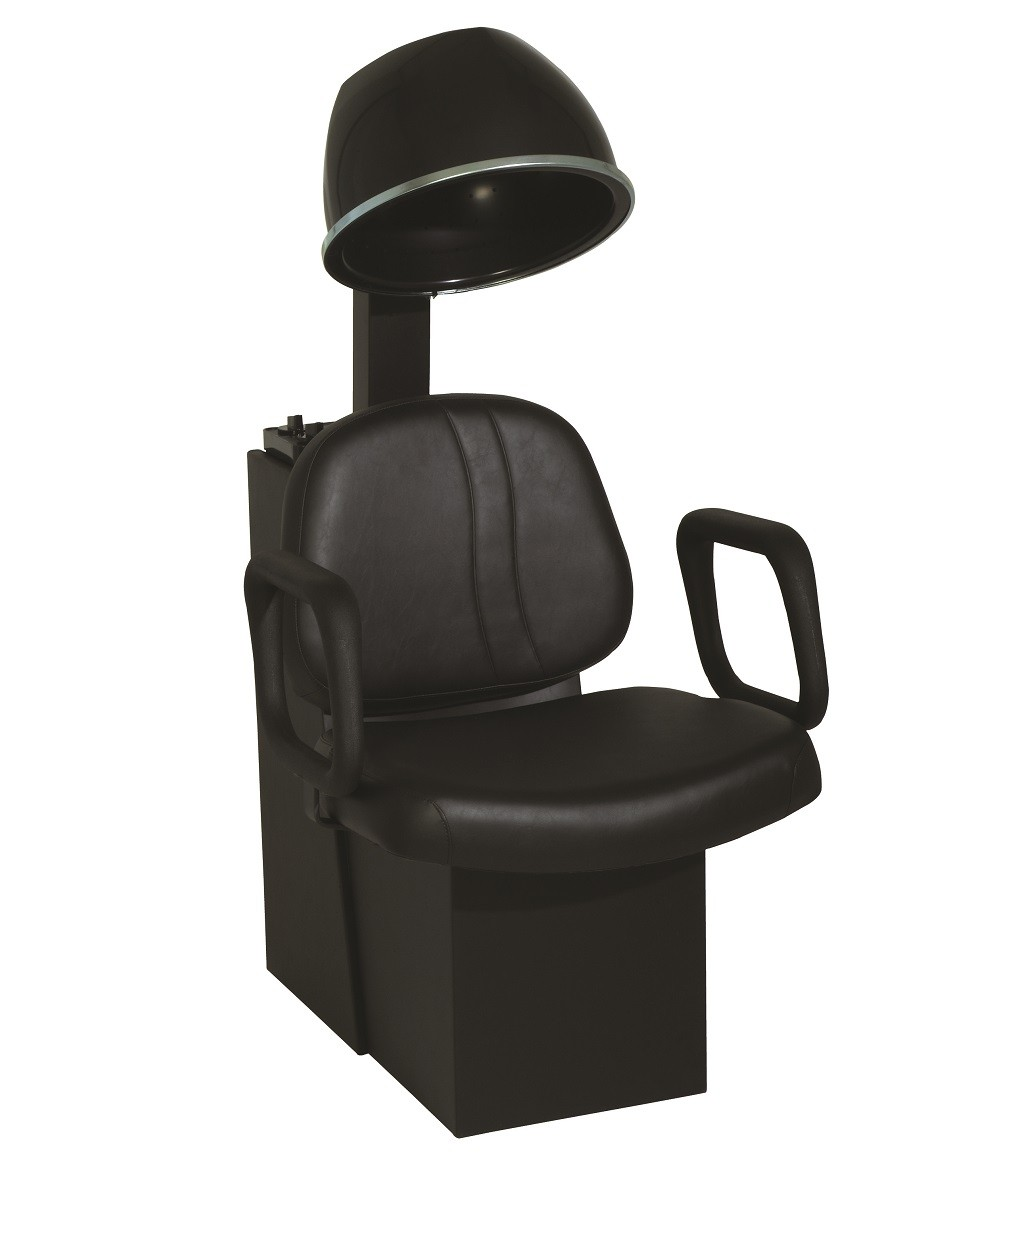 Belvedere LP600DC Lexus Dryer Chair